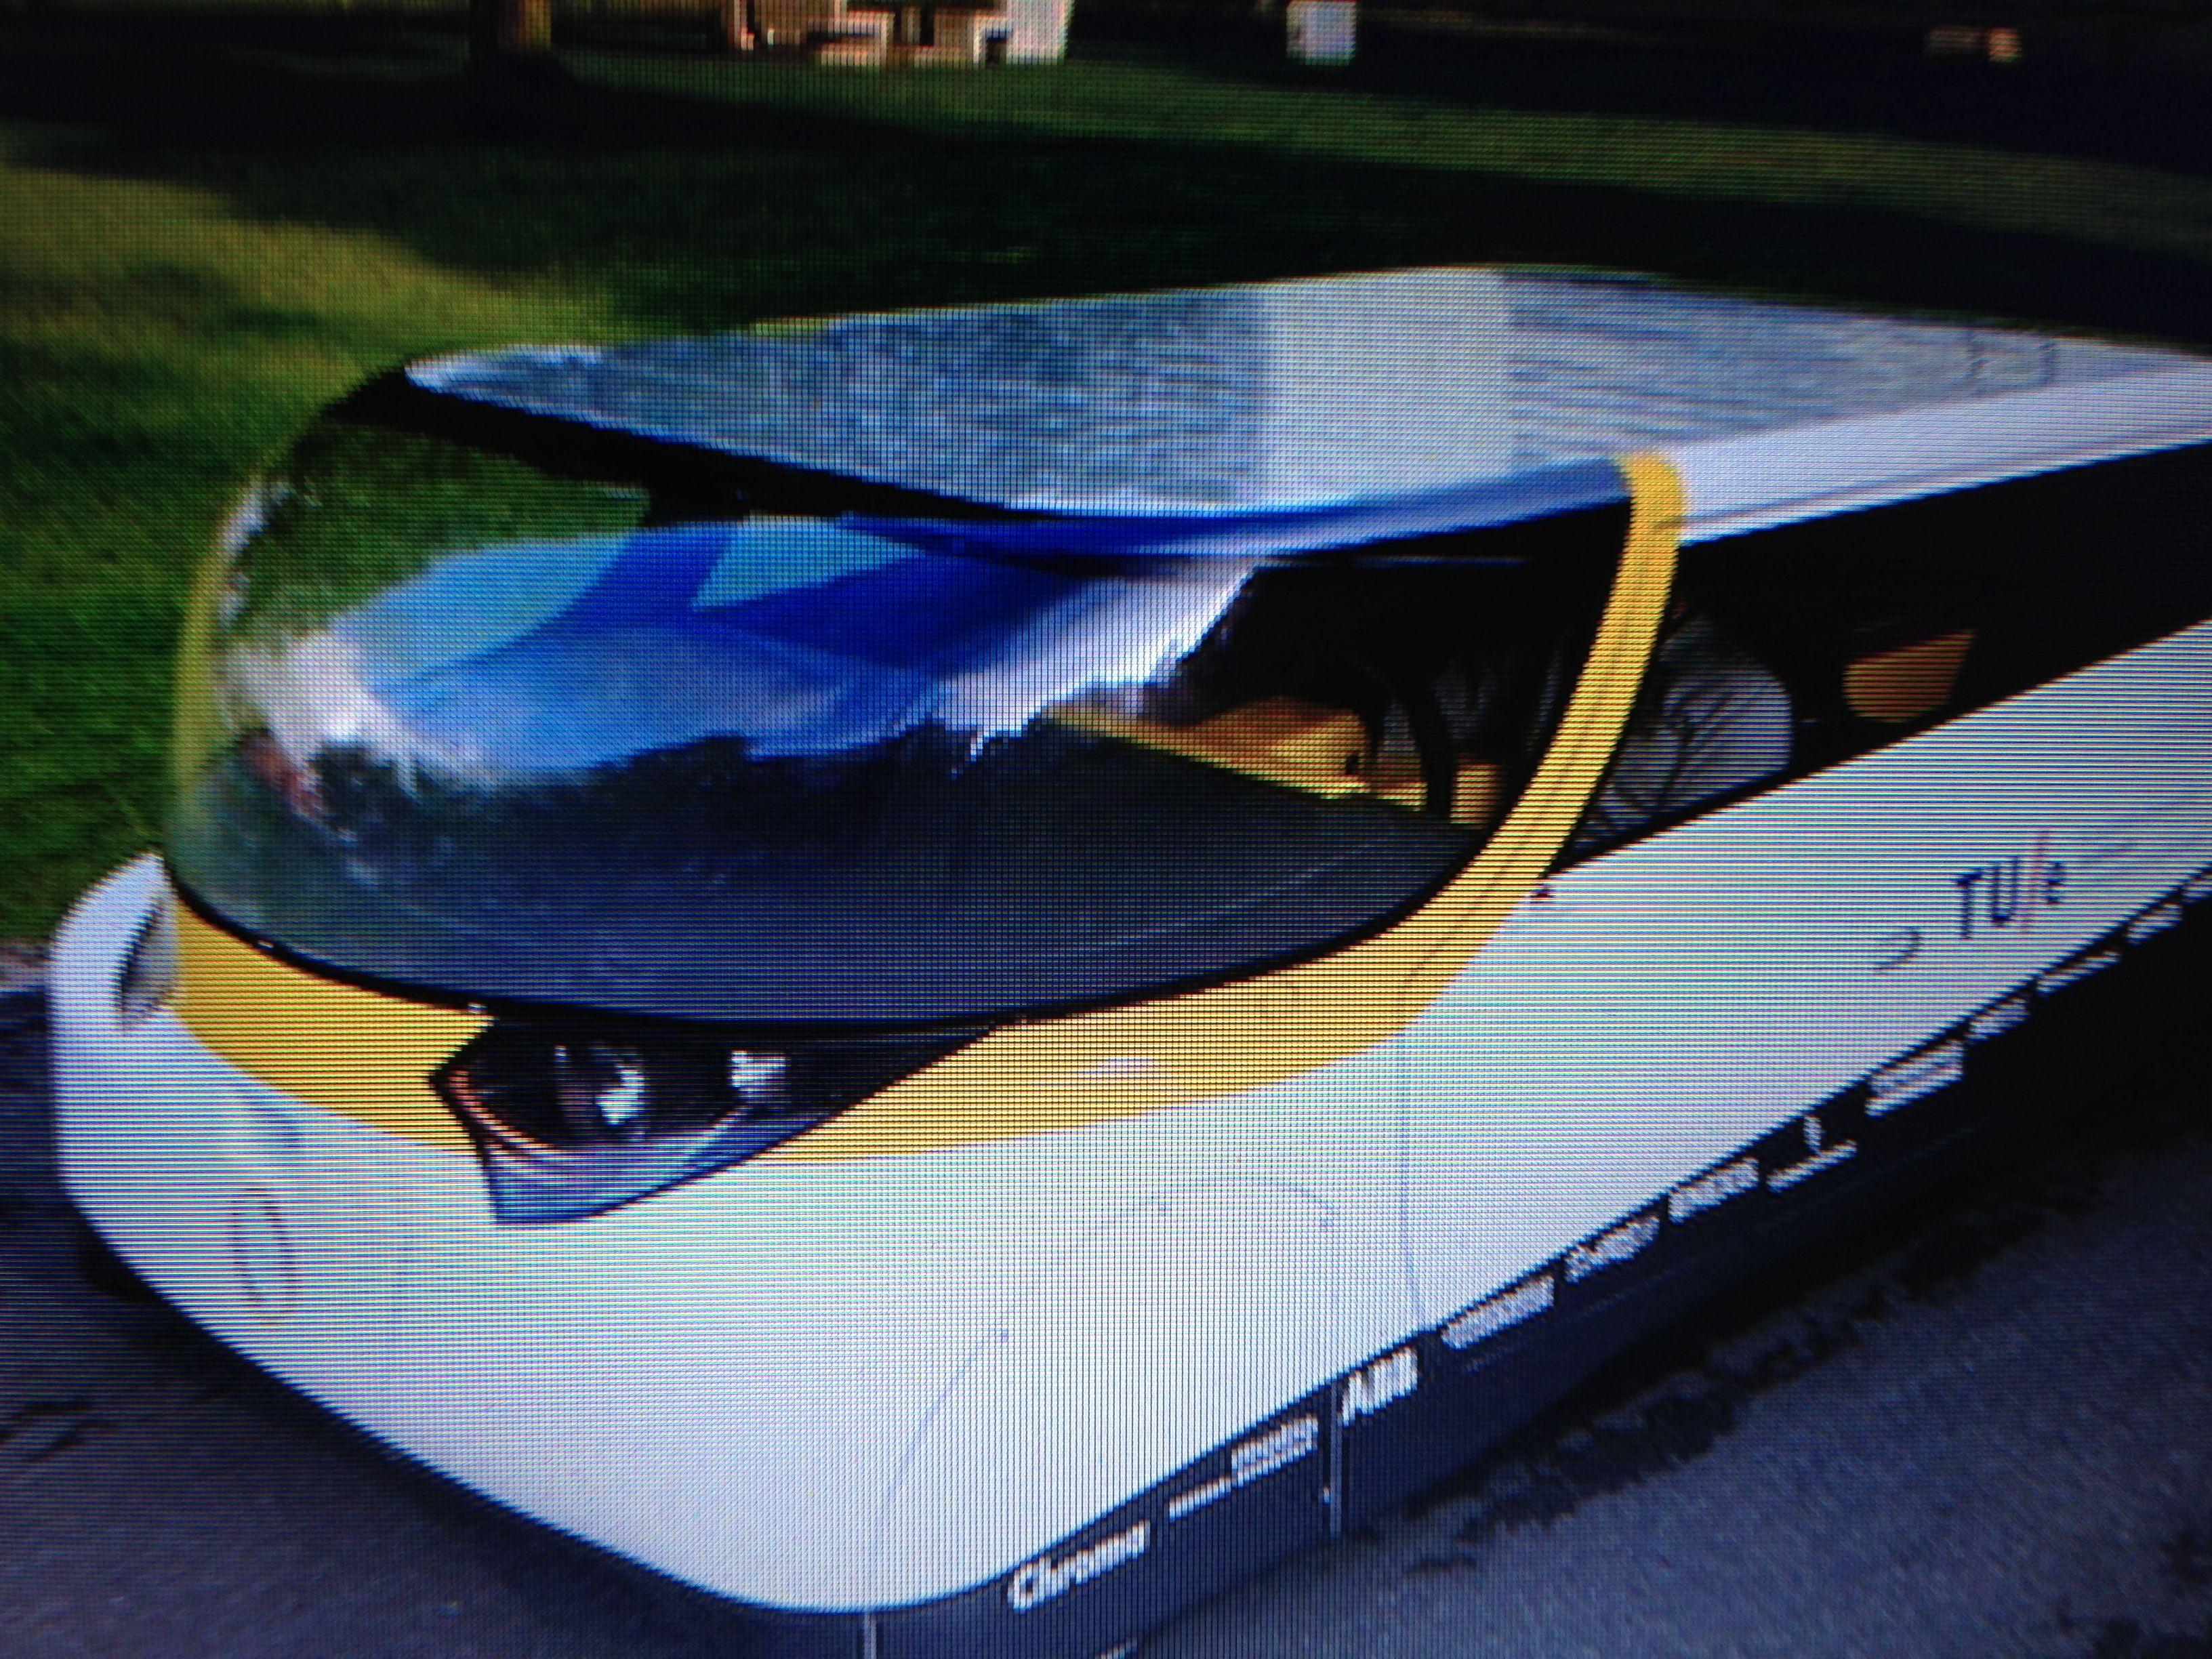 Auto op zonne-energie.